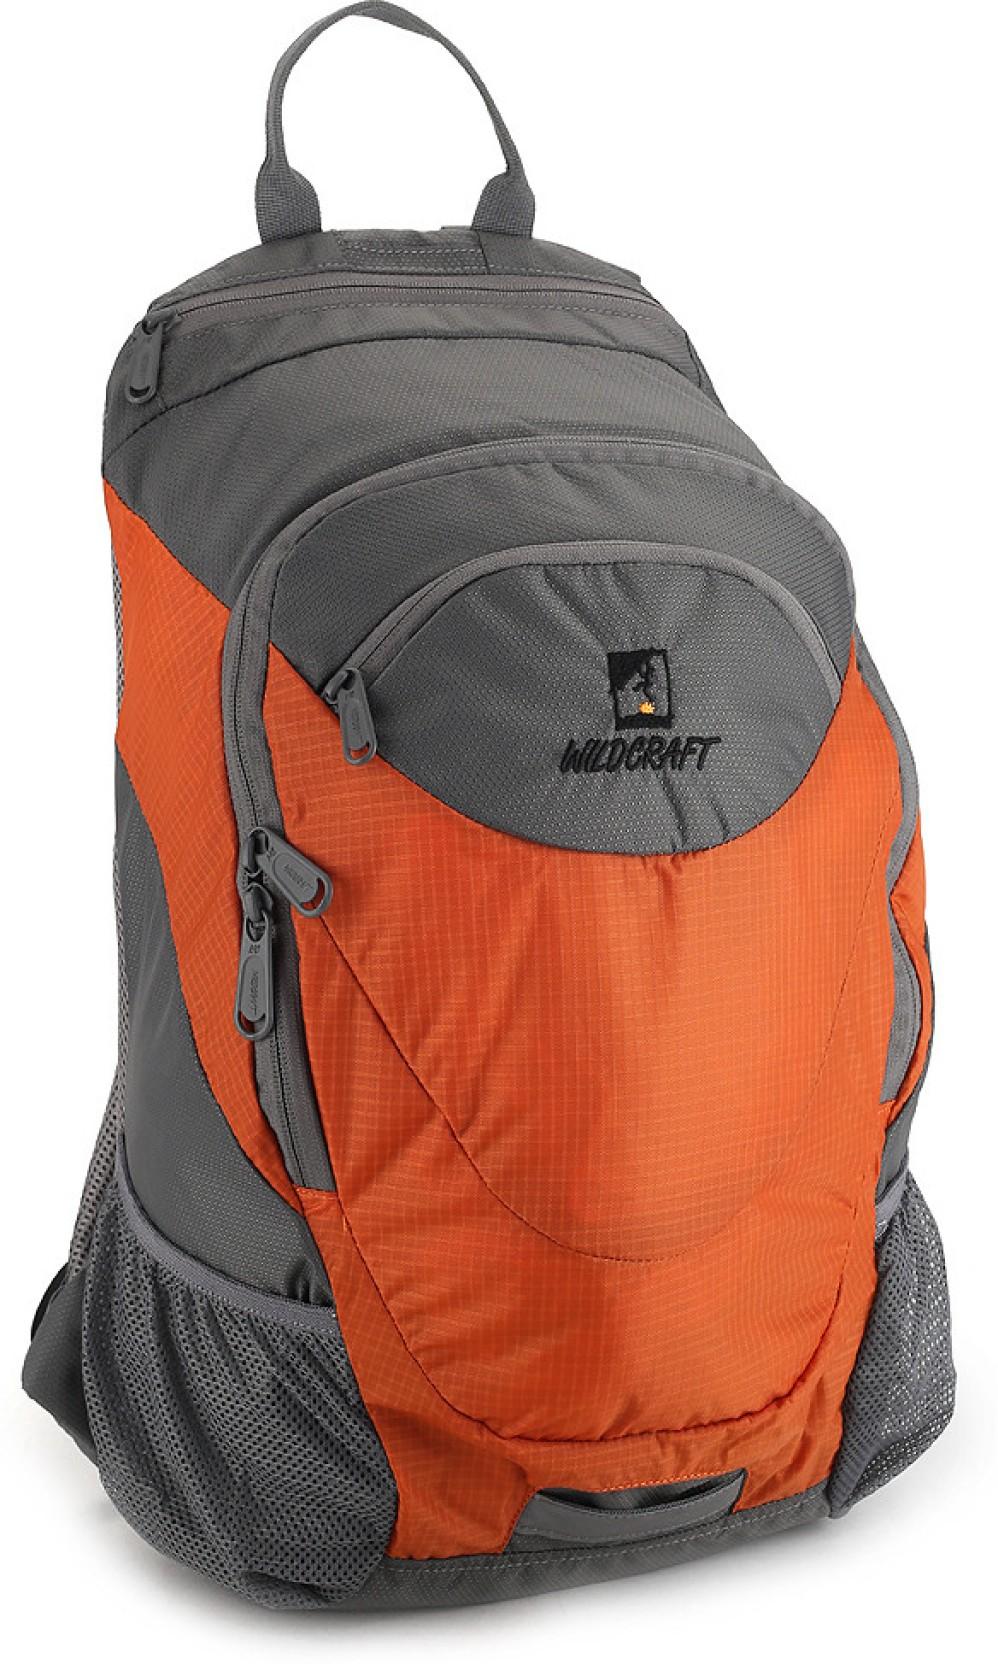 wildcraft daypack a4 20 l backpack orange price in india